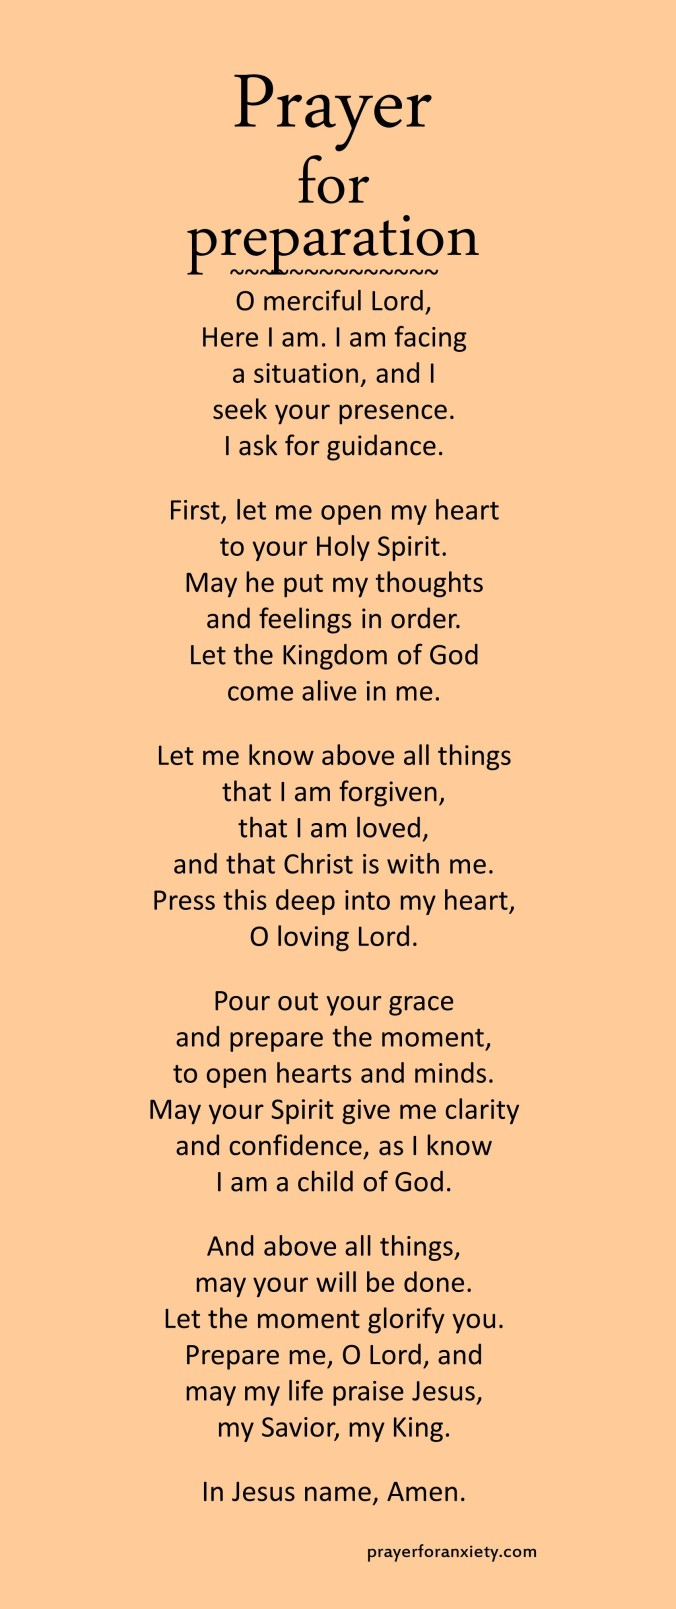 Prayer for preparation